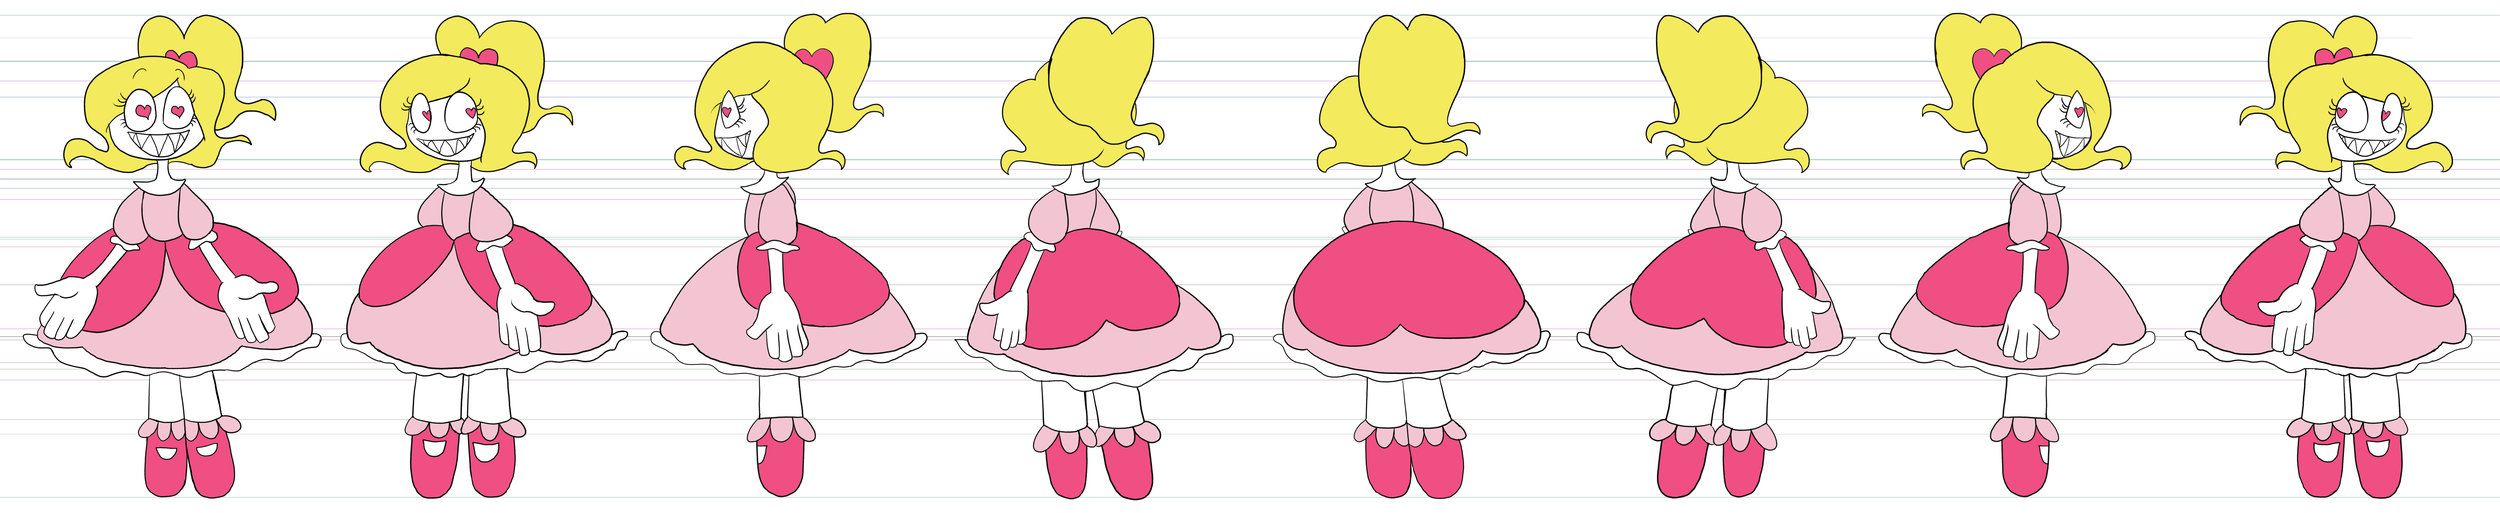 SGG Fangirl Character Sheet